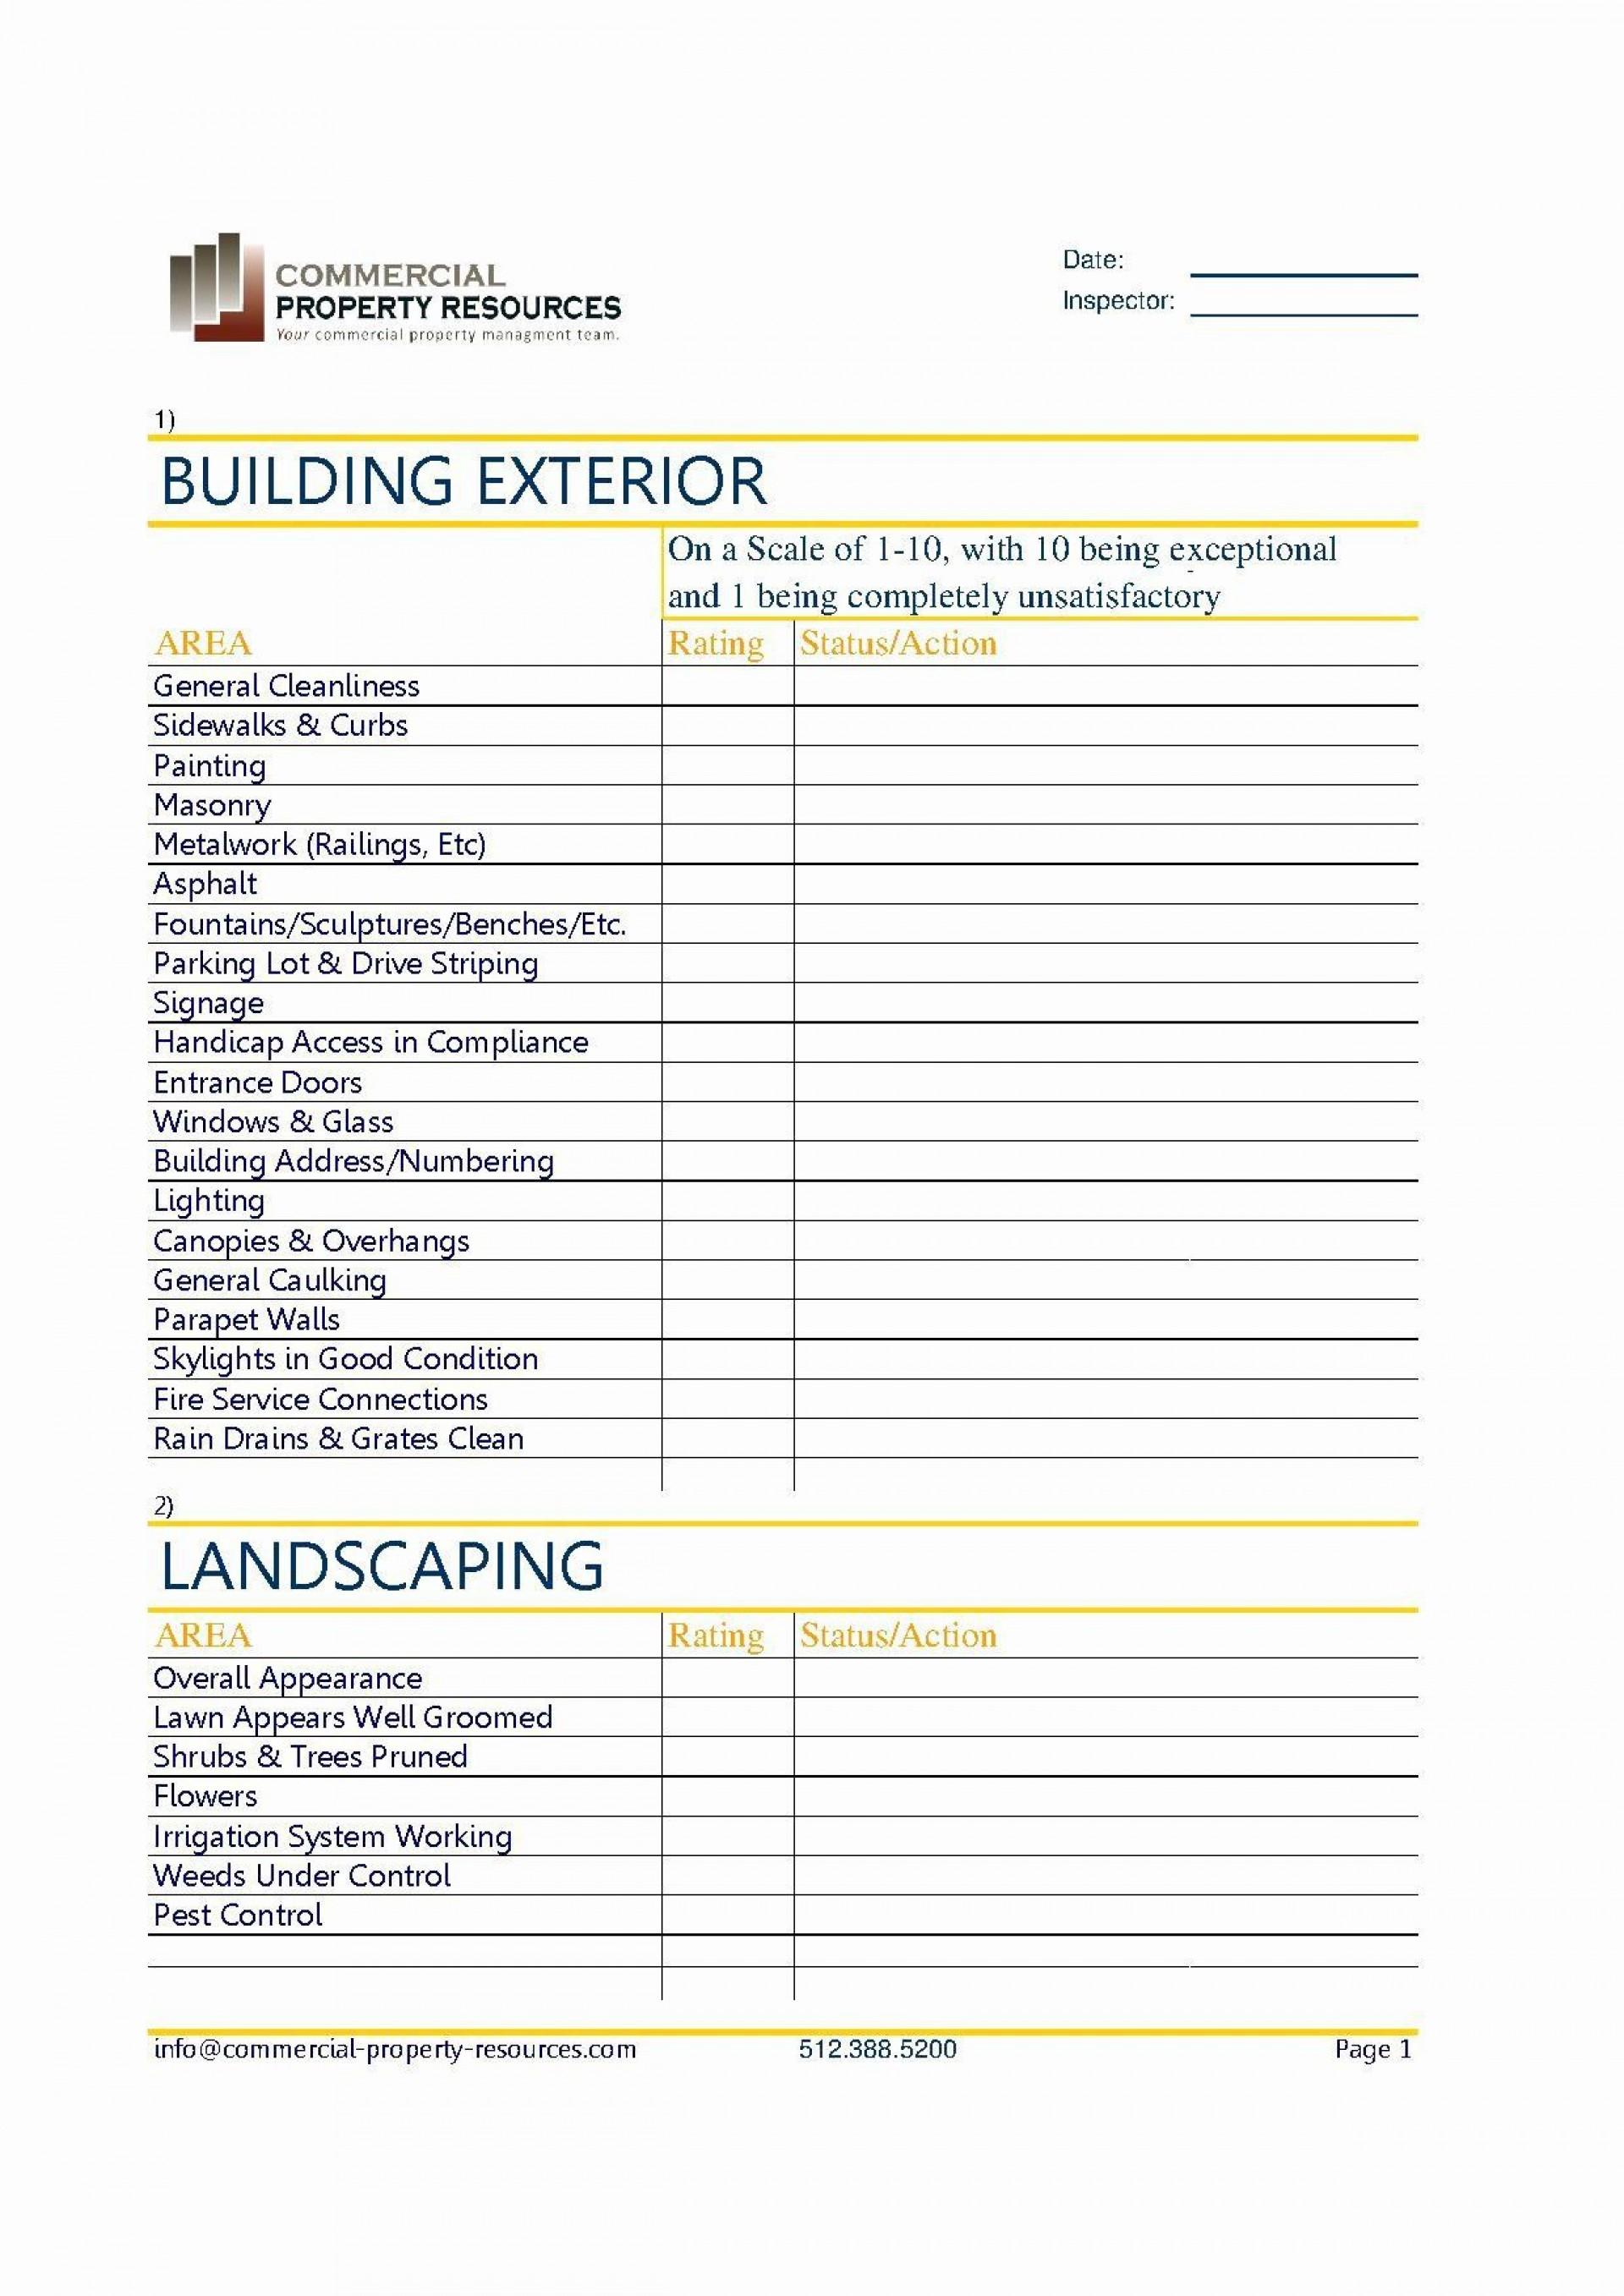 002 Magnificent Property Management Maintenance Checklist Template Image  Free1920